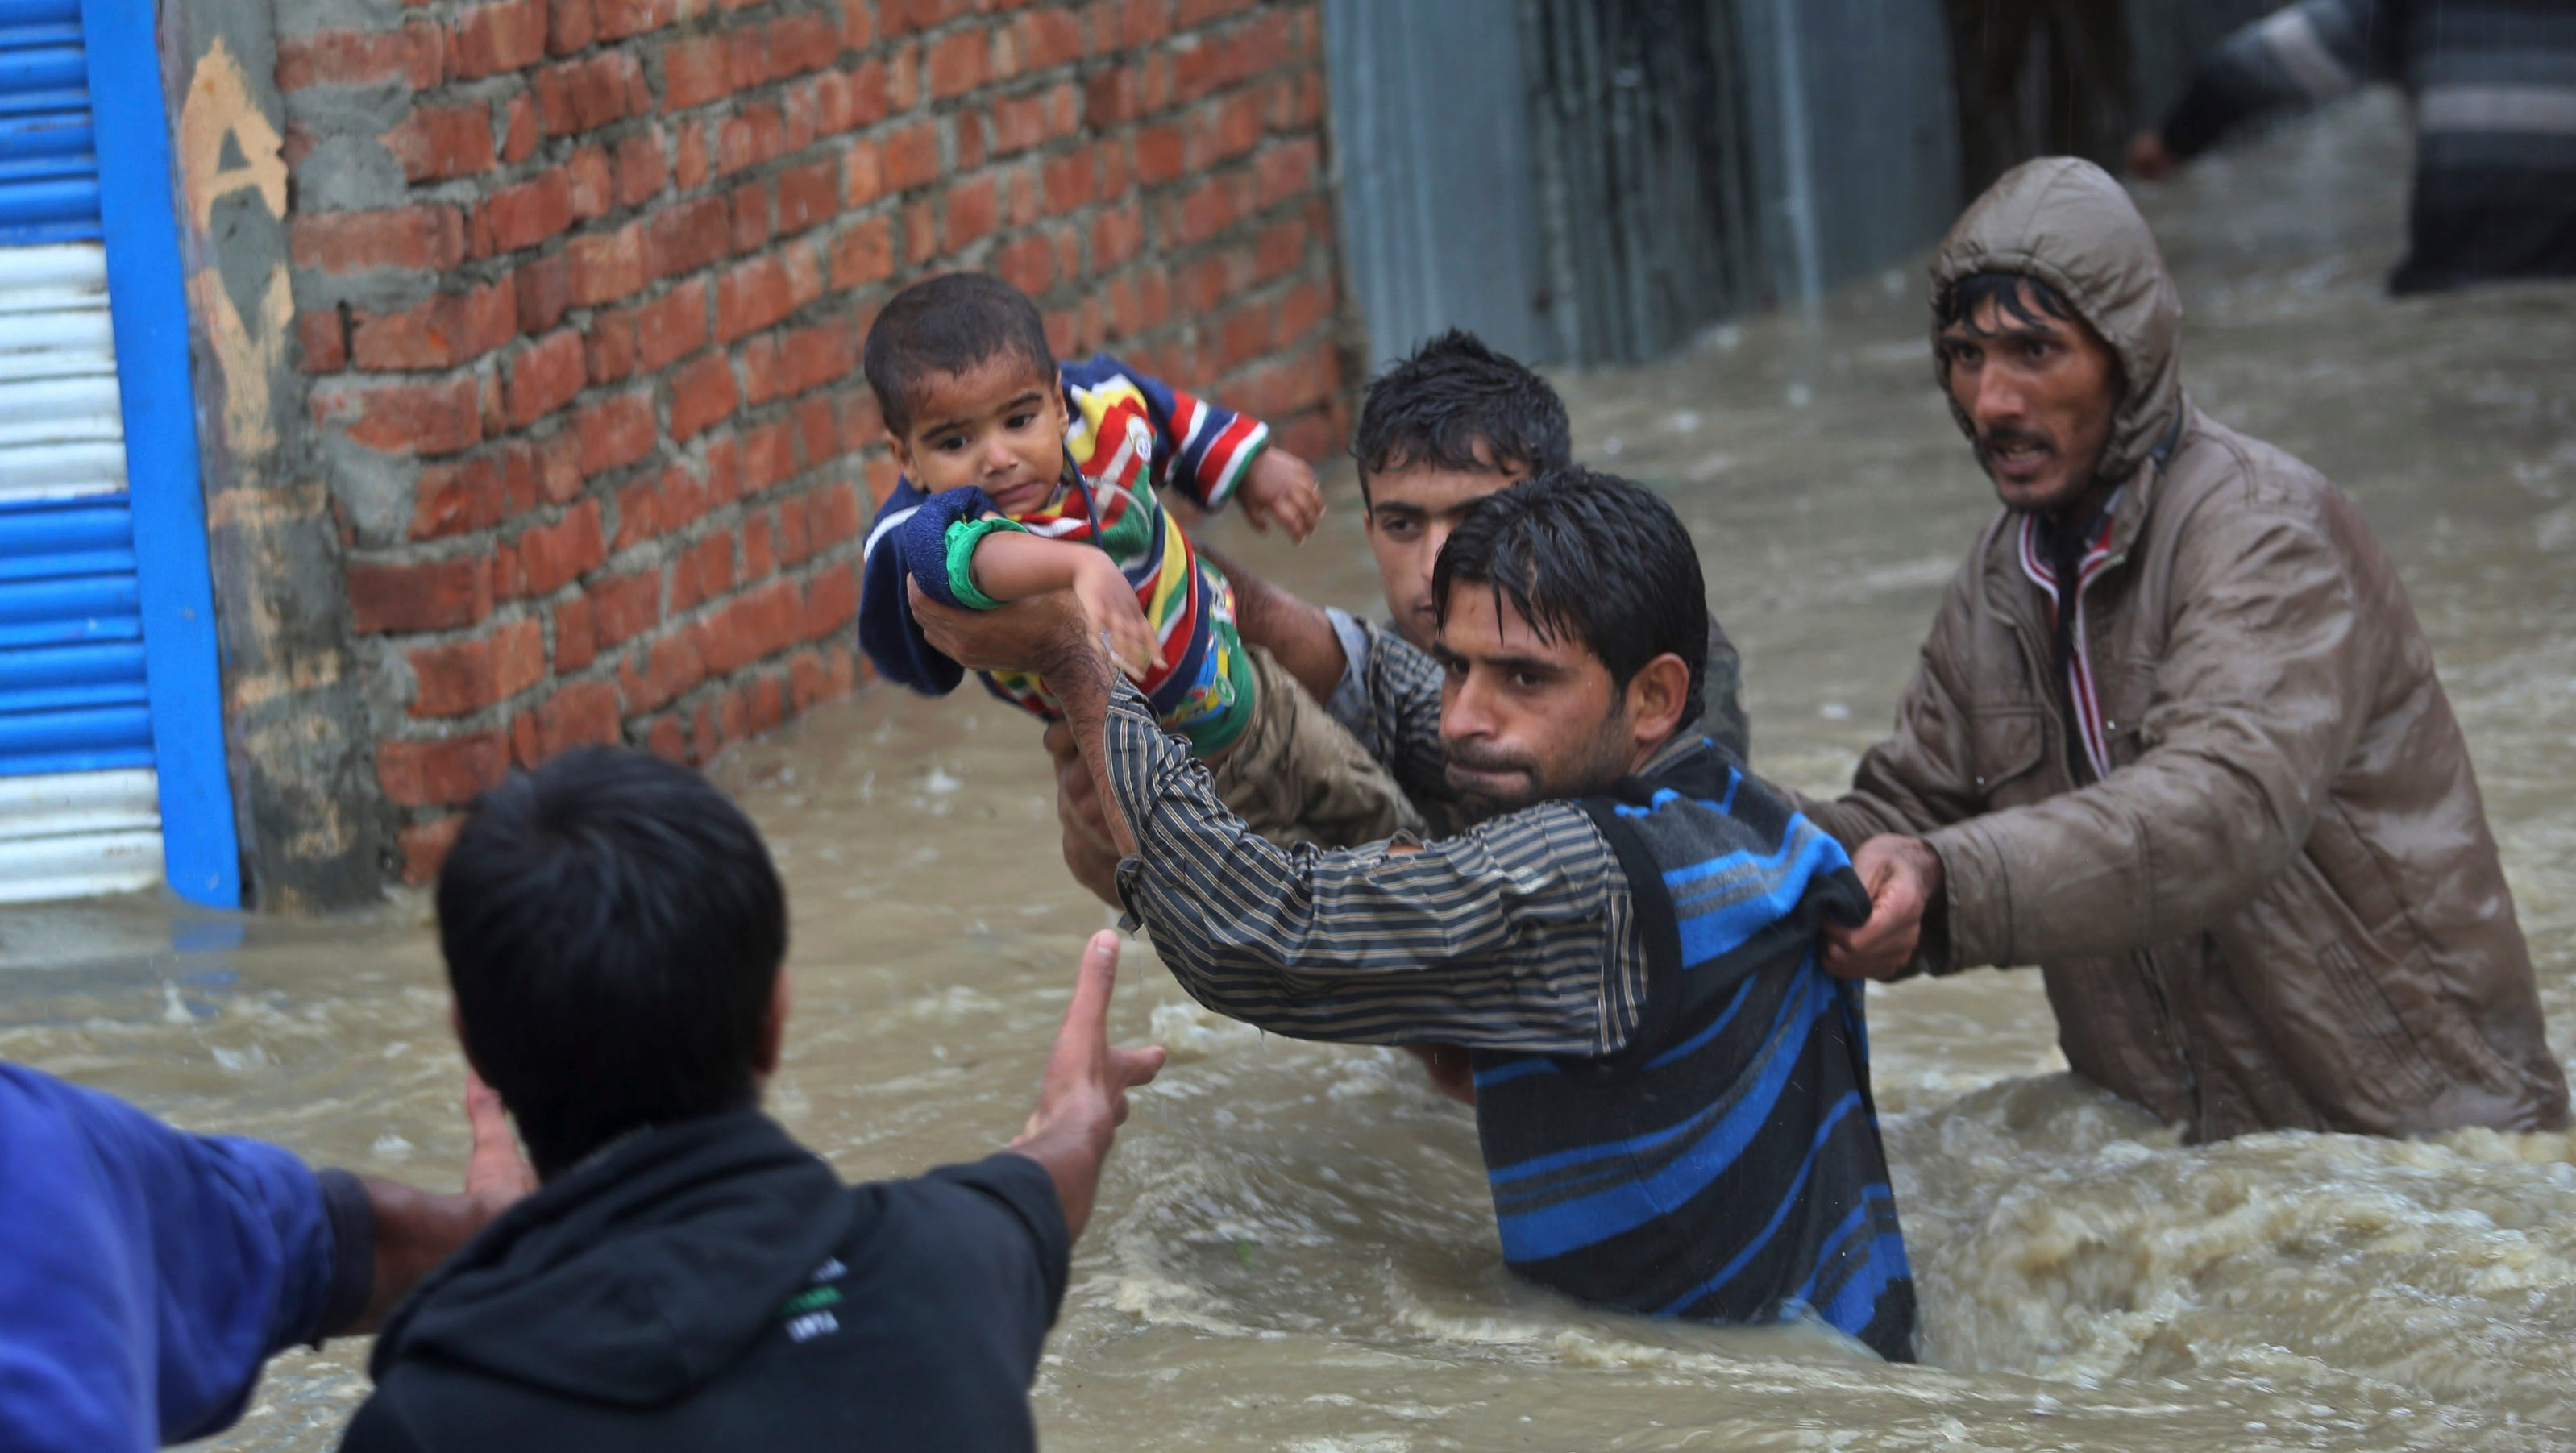 Bus swept away in Kashmir flooding; 70 missing